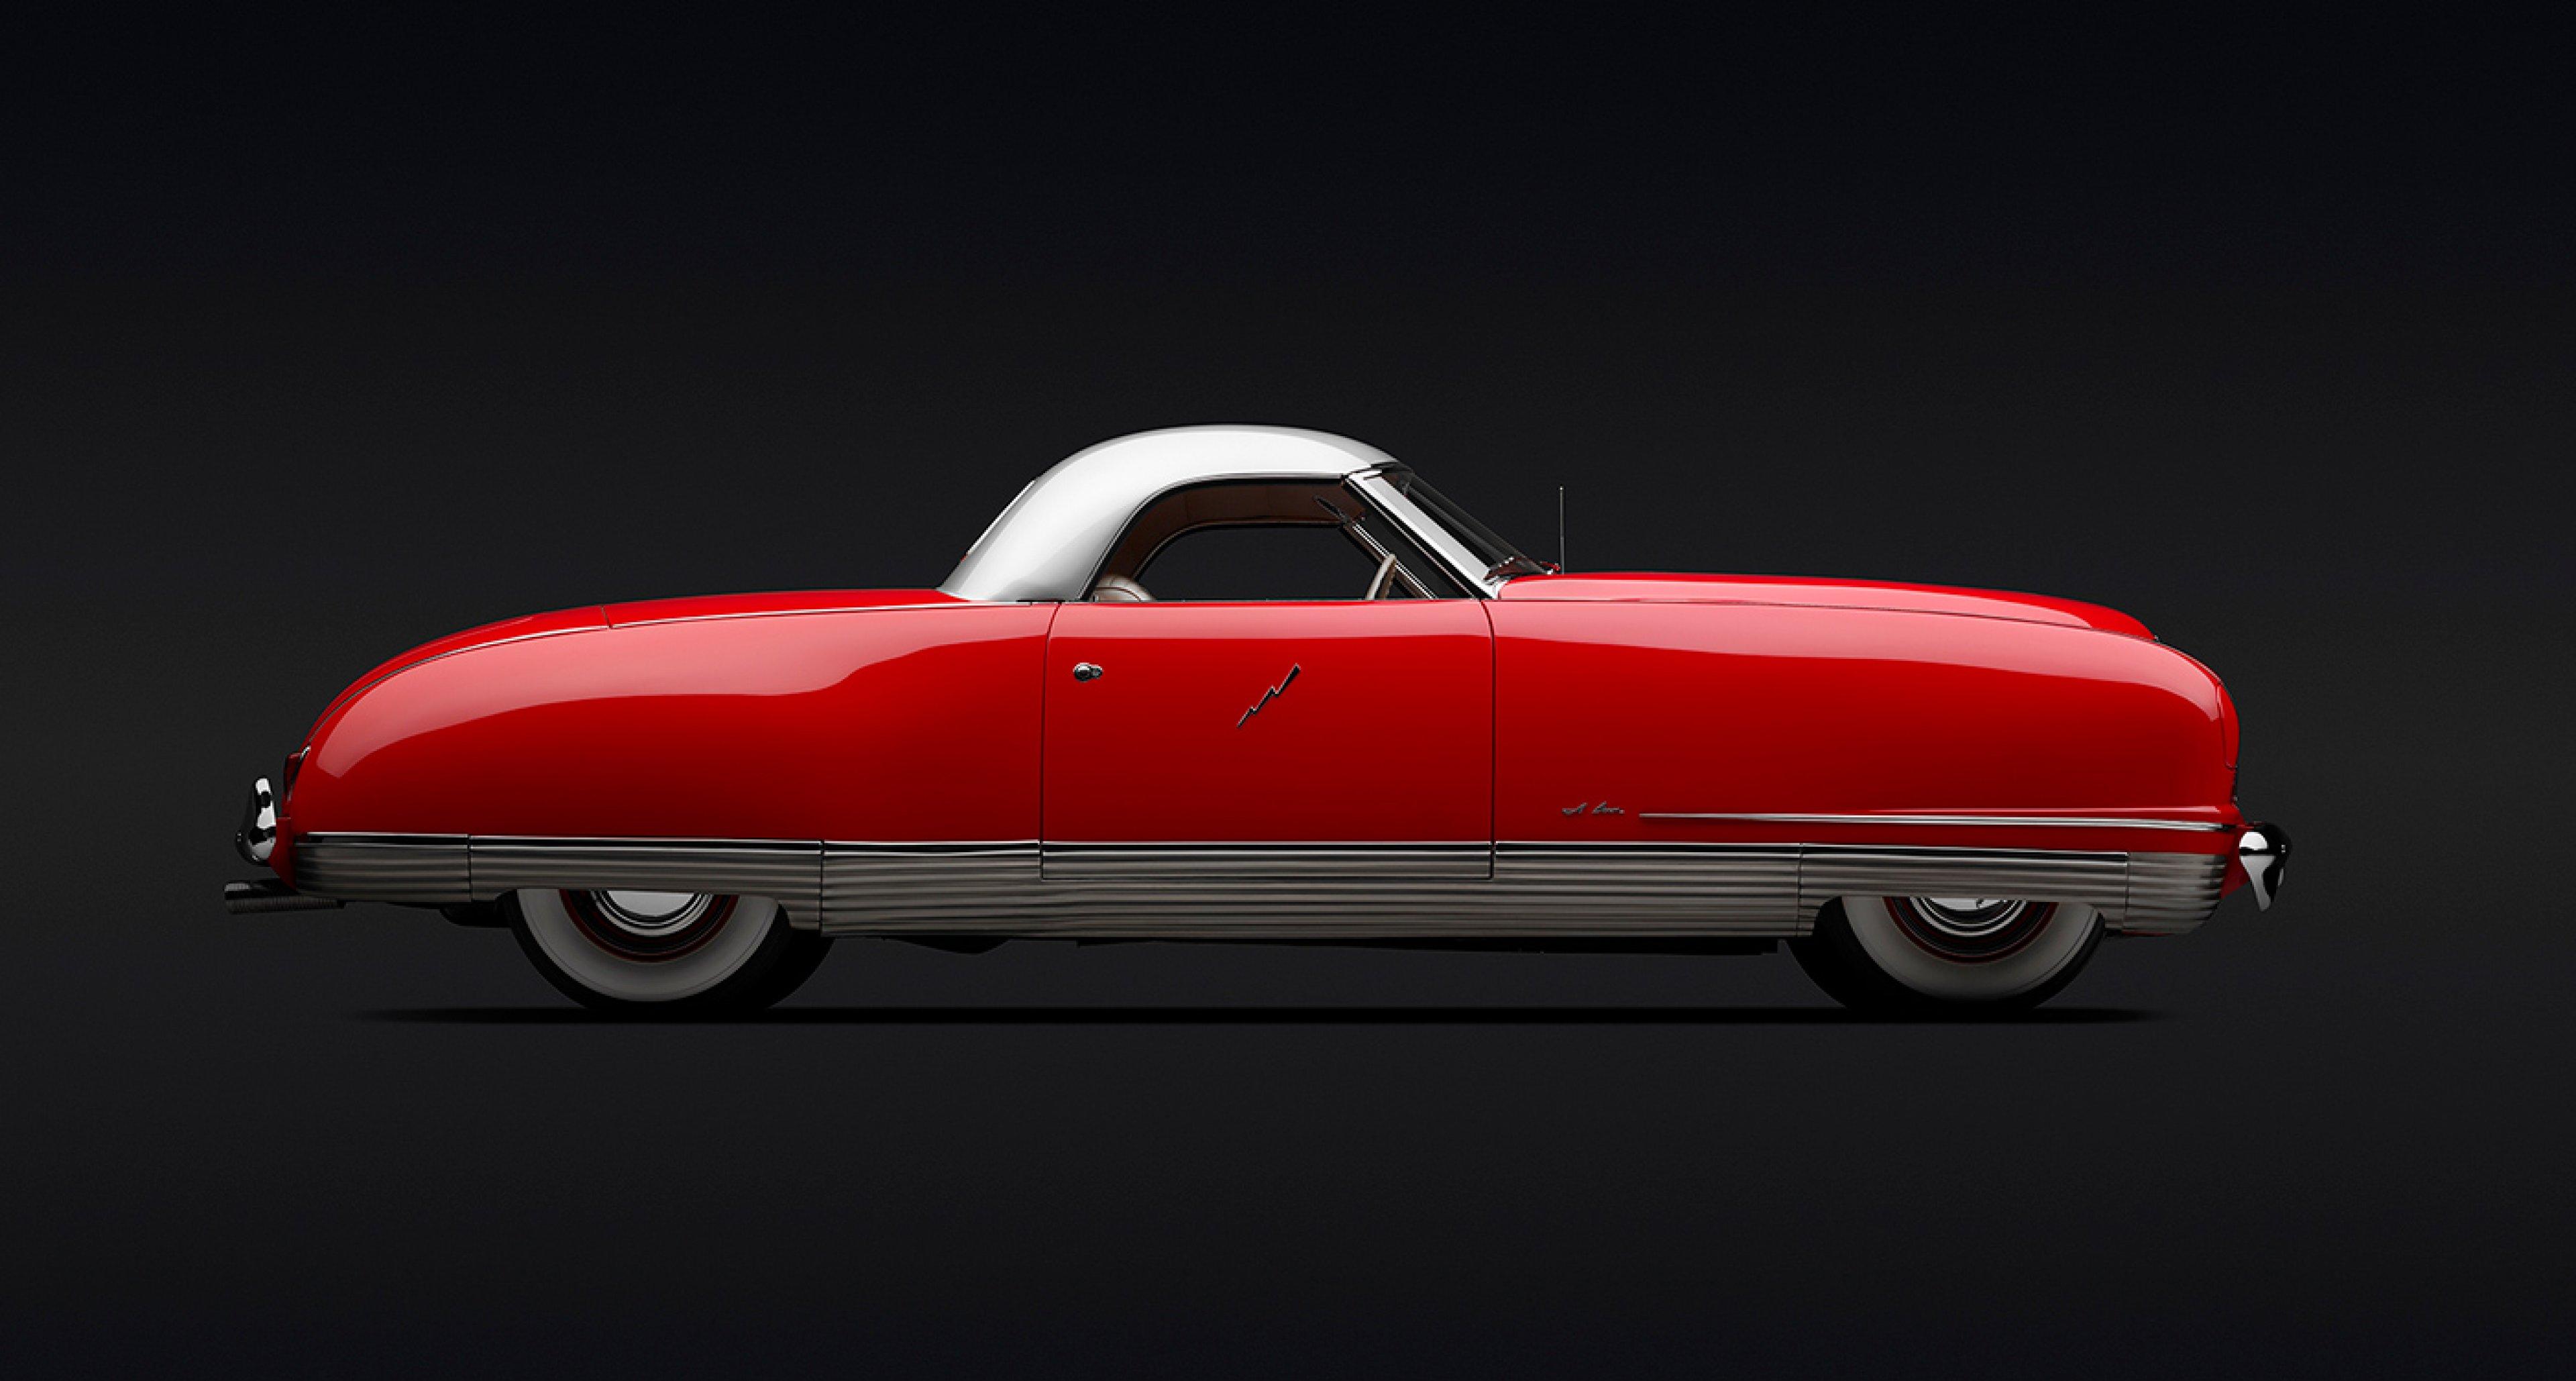 Chrysler Thunderbolt, 1941, Collection of Roger Willbanks; Photo © 2016 Michael Furman